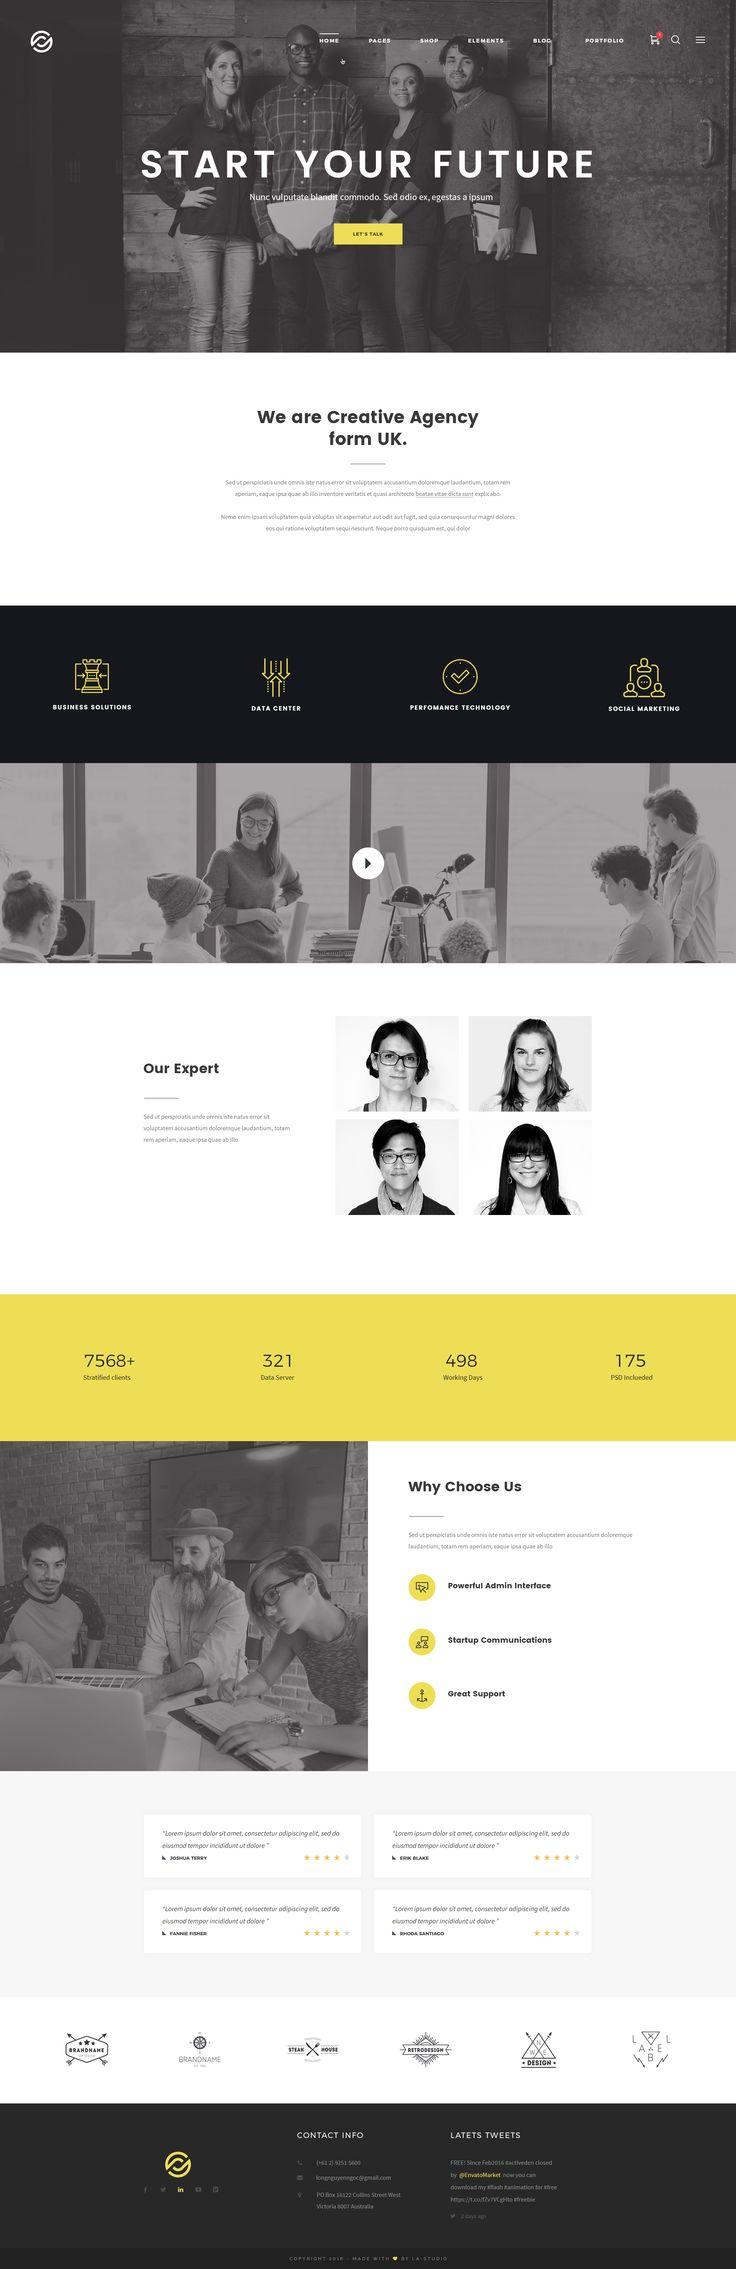 Optima - Multipurpose PSD Template by LA-Studio | ThemeForest